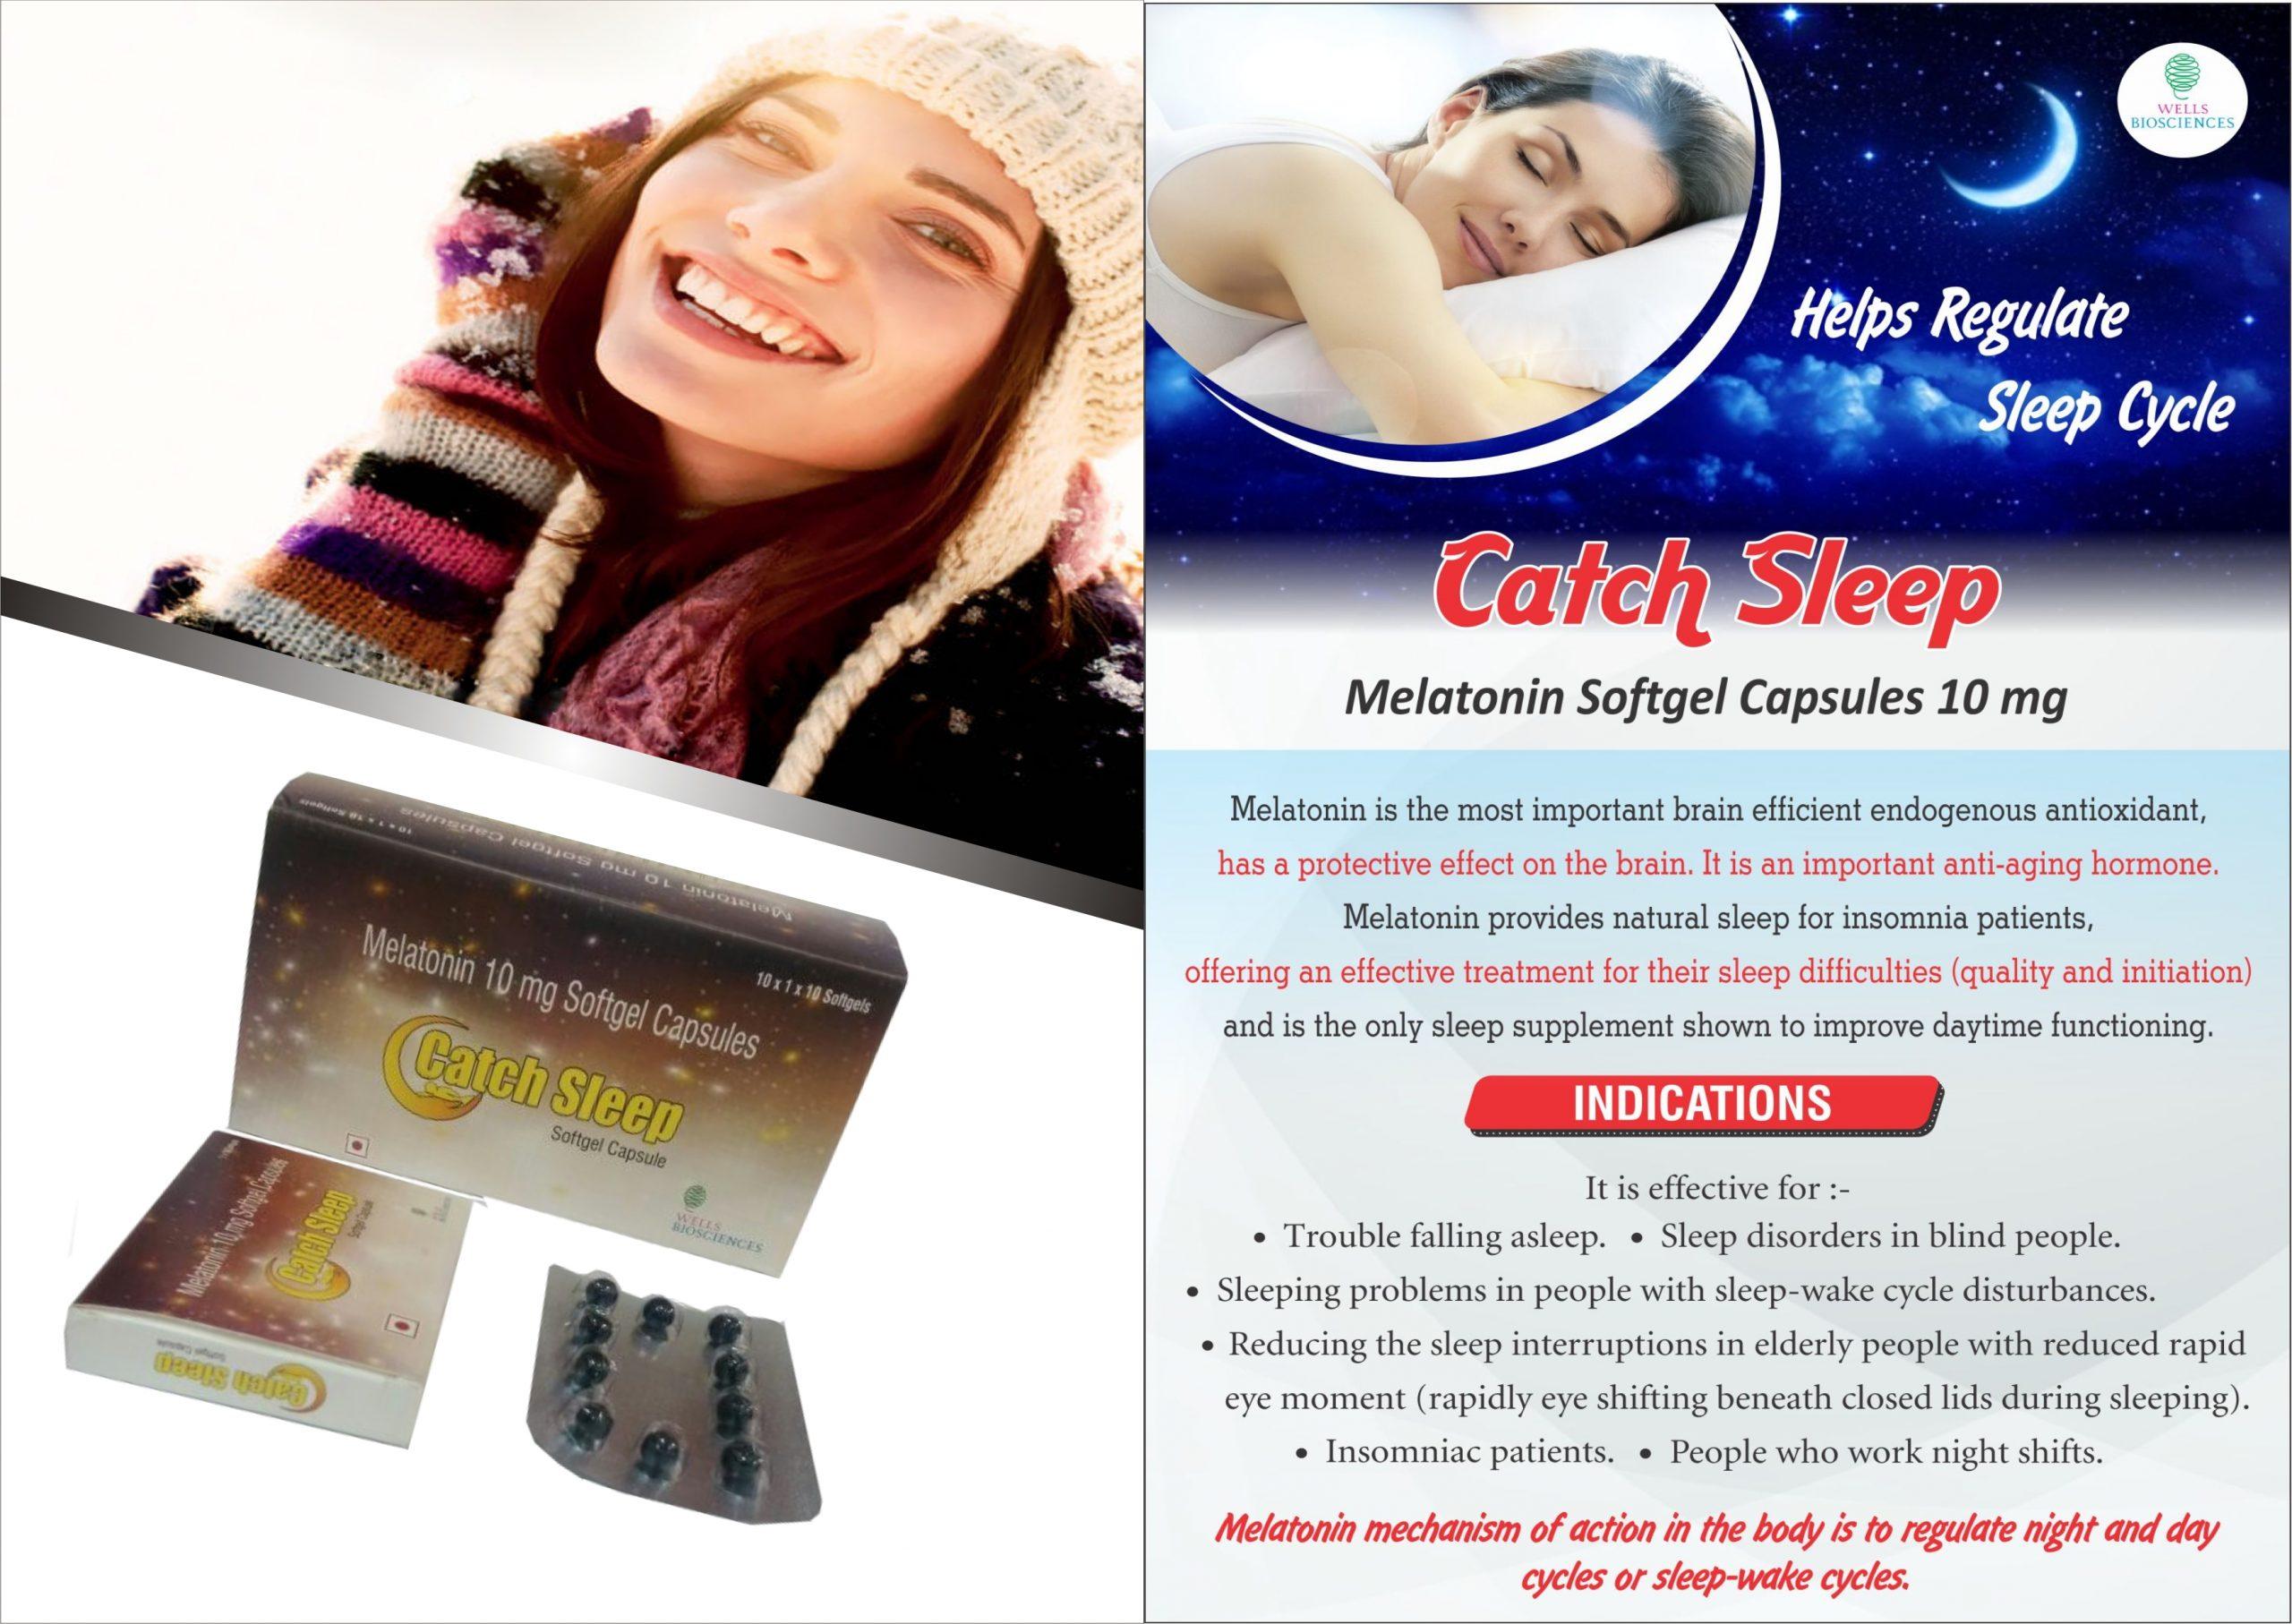 Catch Sleep